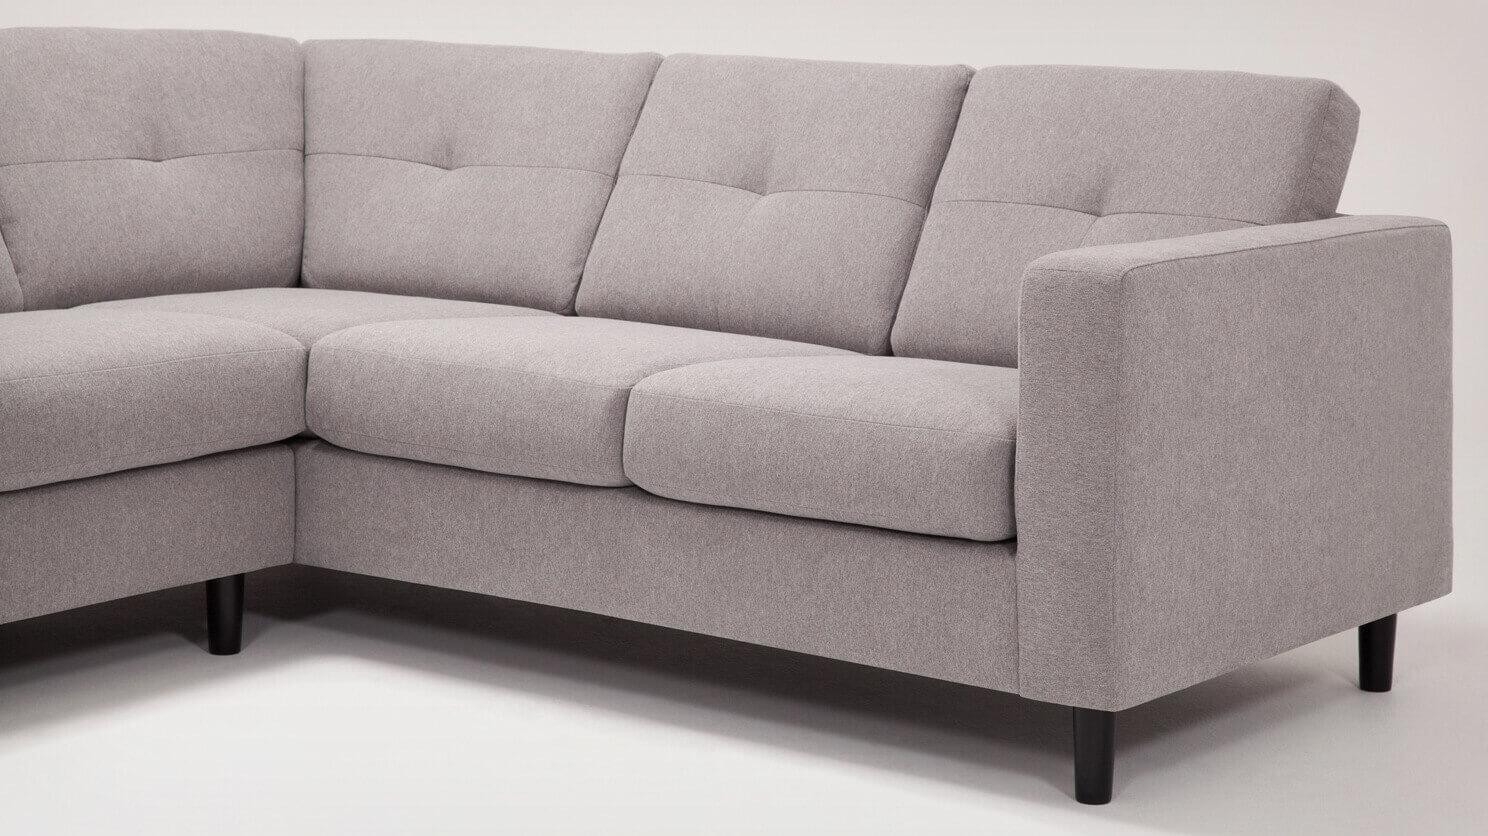 Surprising Solo 6 Seat Sectional Sofa D3 Home San Diego Furniture Eq3 Customarchery Wood Chair Design Ideas Customarcherynet